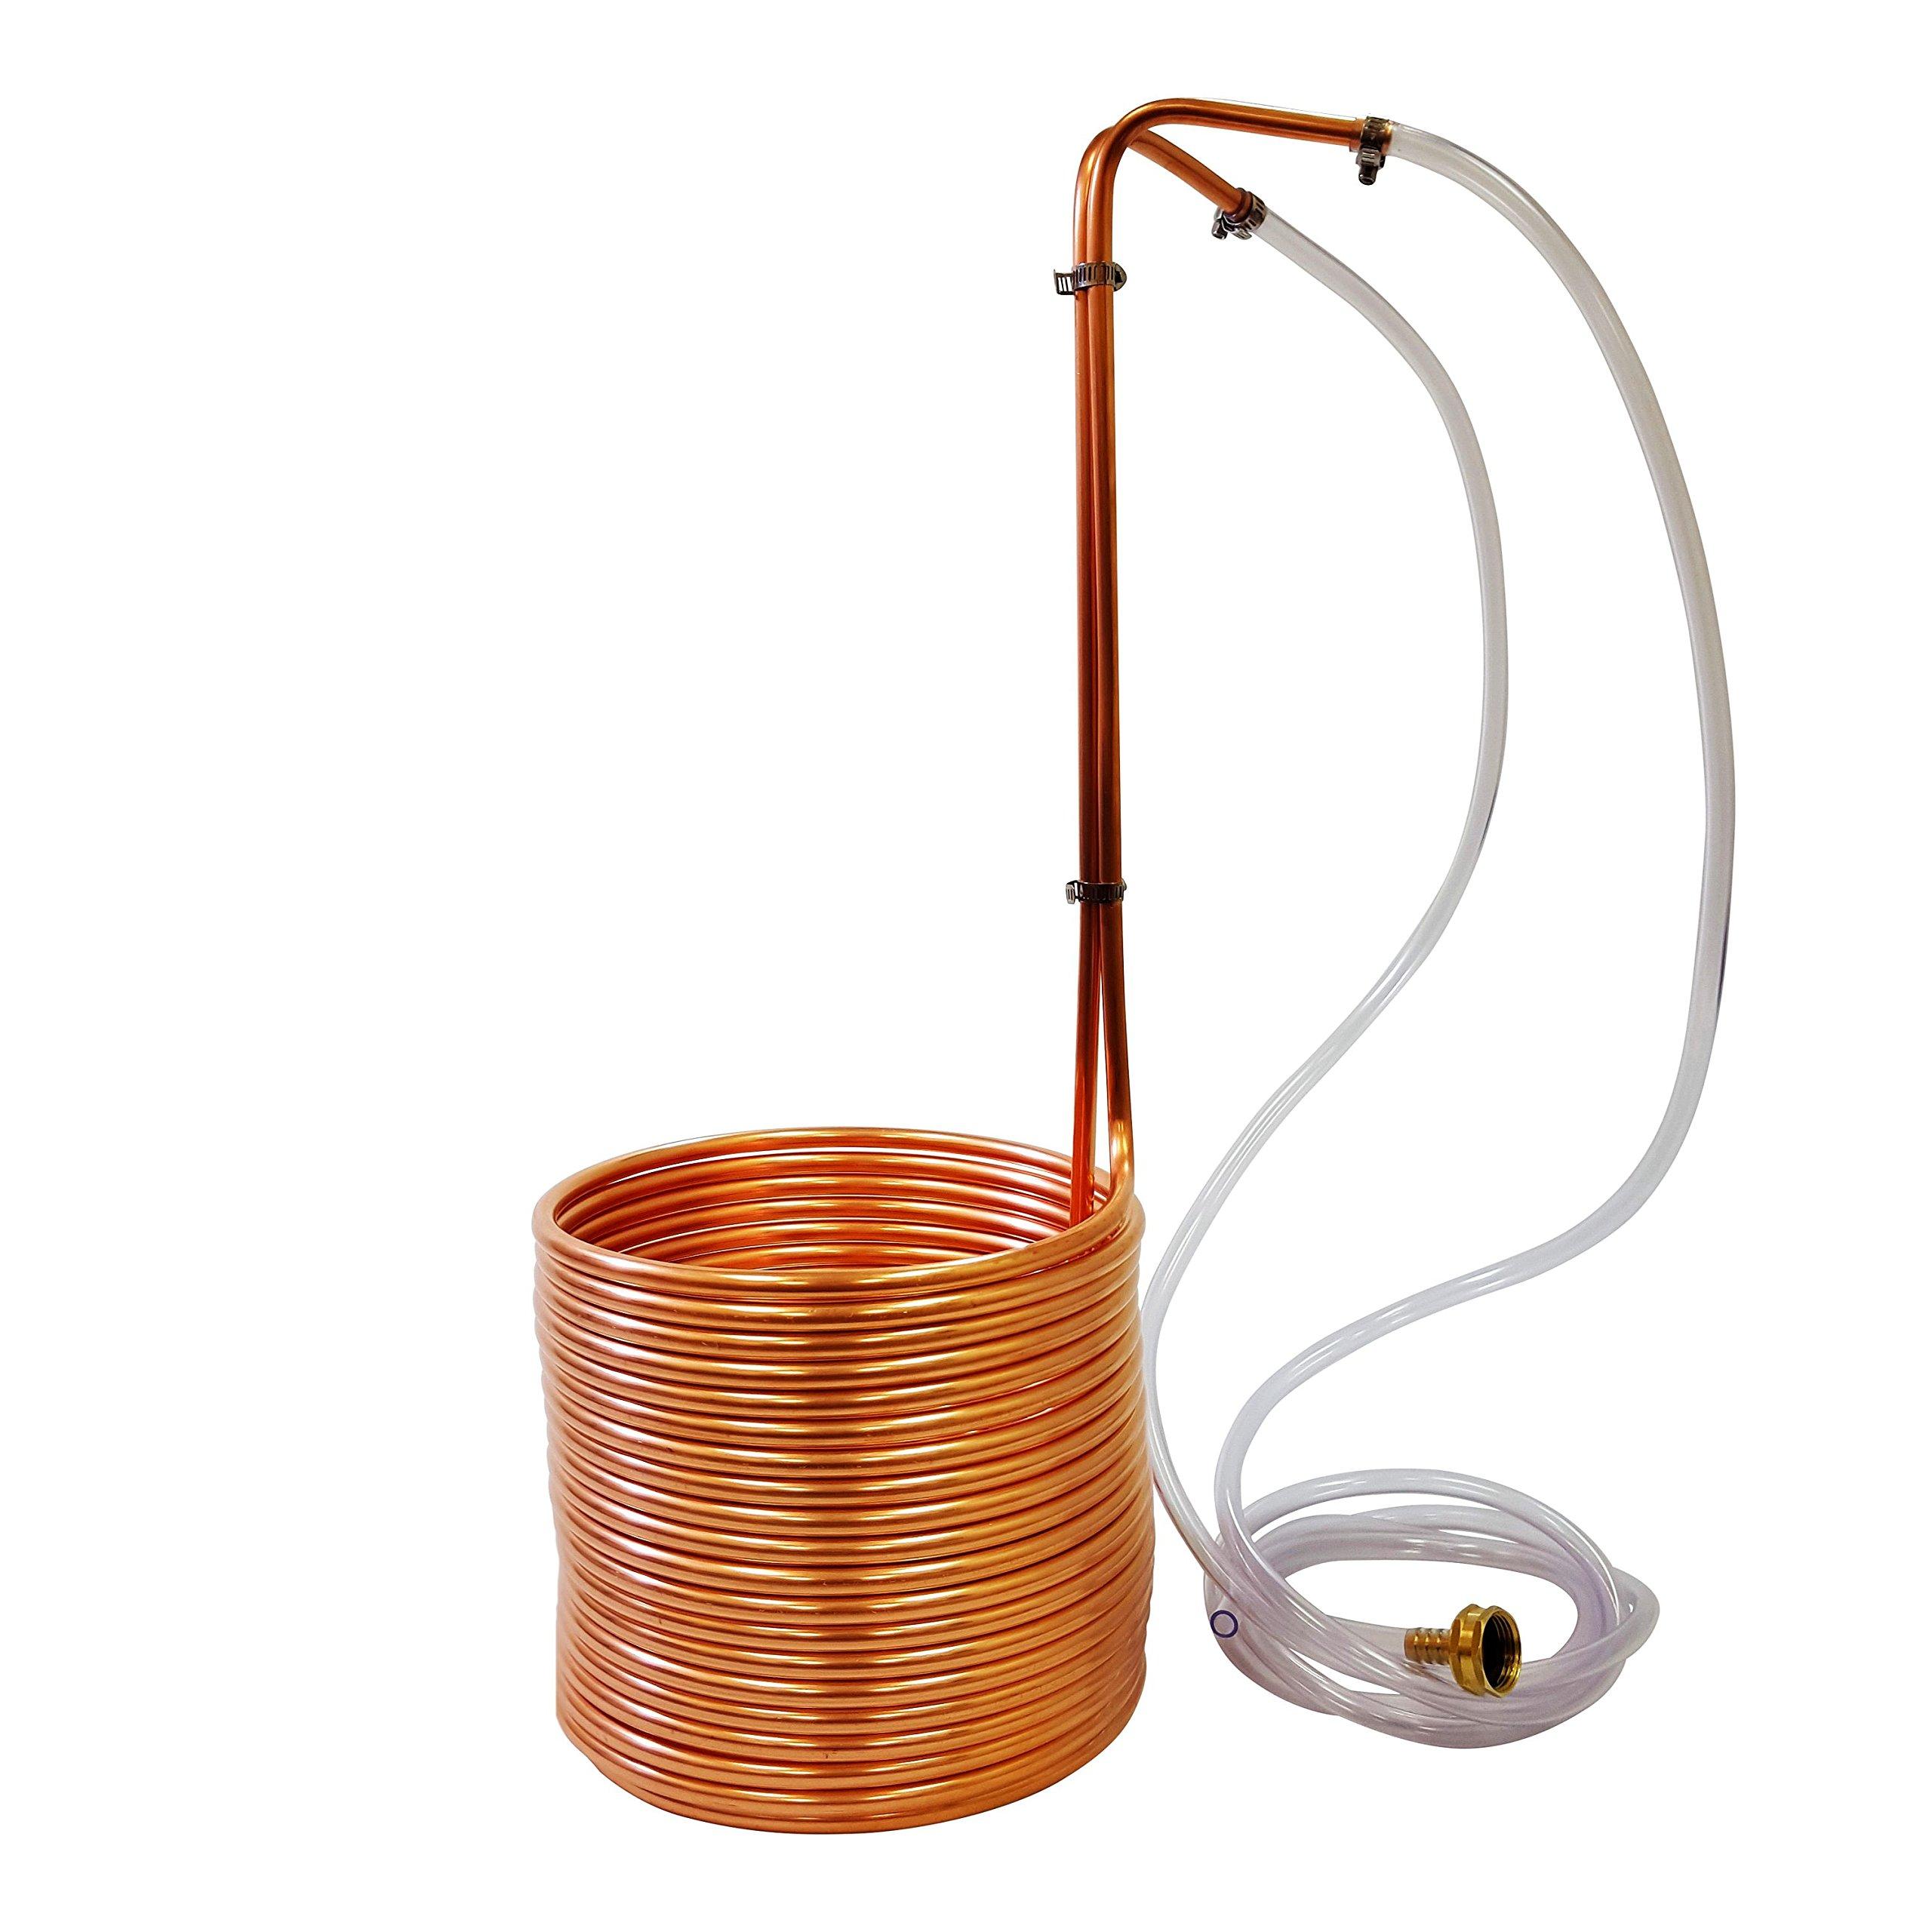 NY Brew Supply W3850-CV Super Efficient 3/8 x 50' Copper Wort Chiller